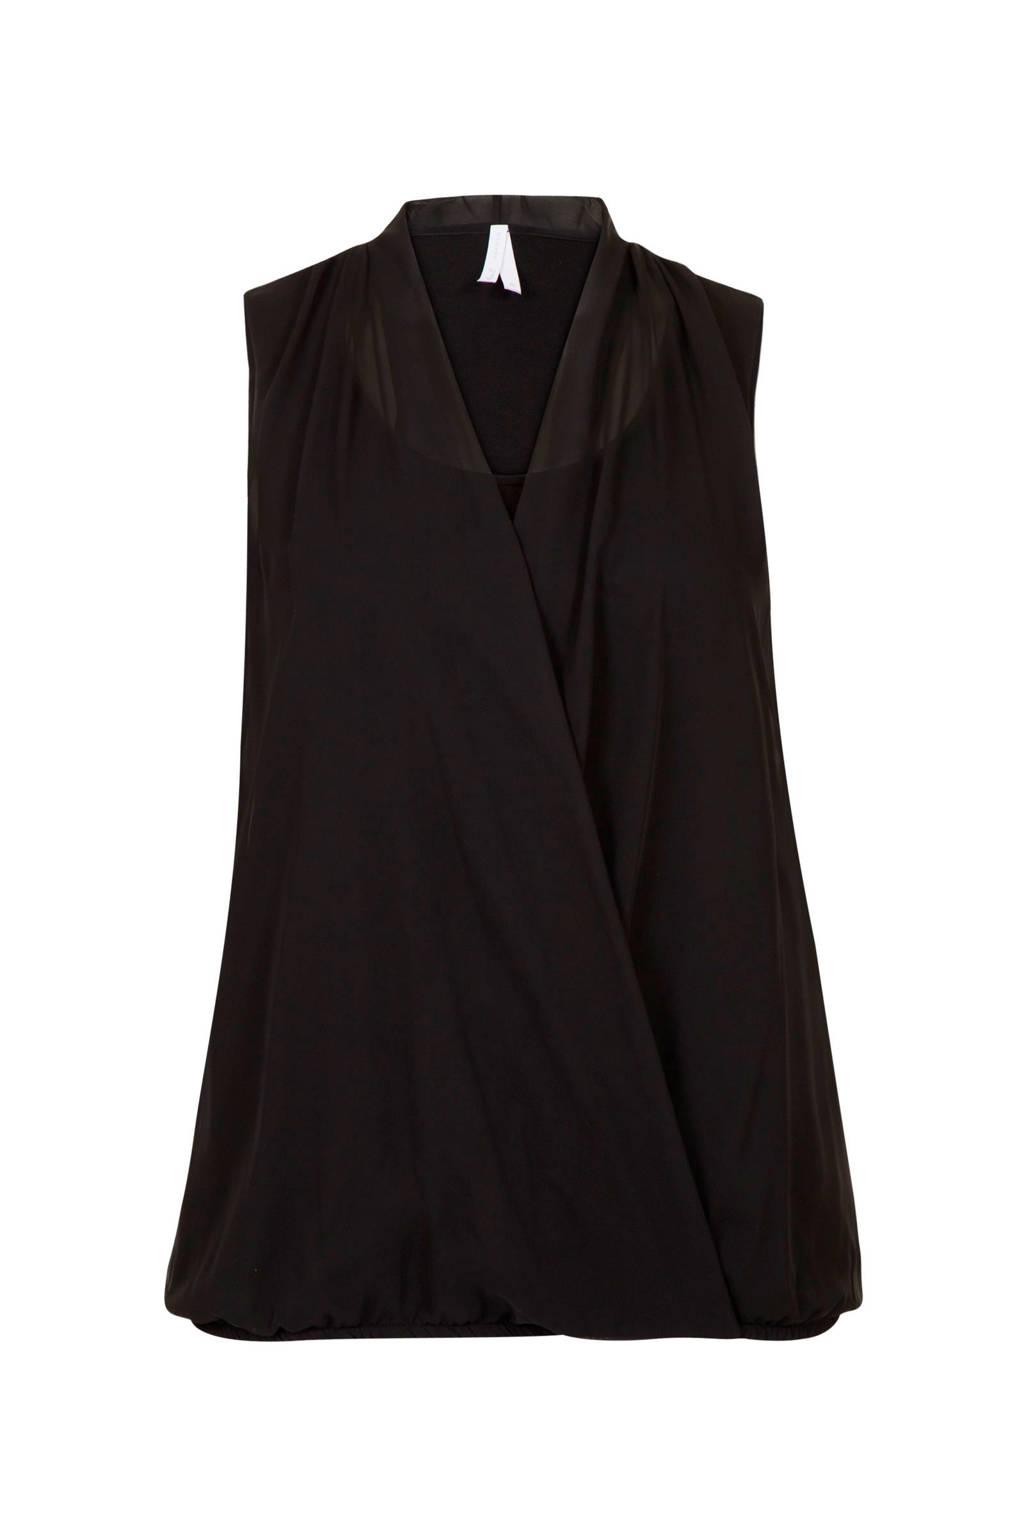 Miss Etam Plus overslag top zwart, Zwart